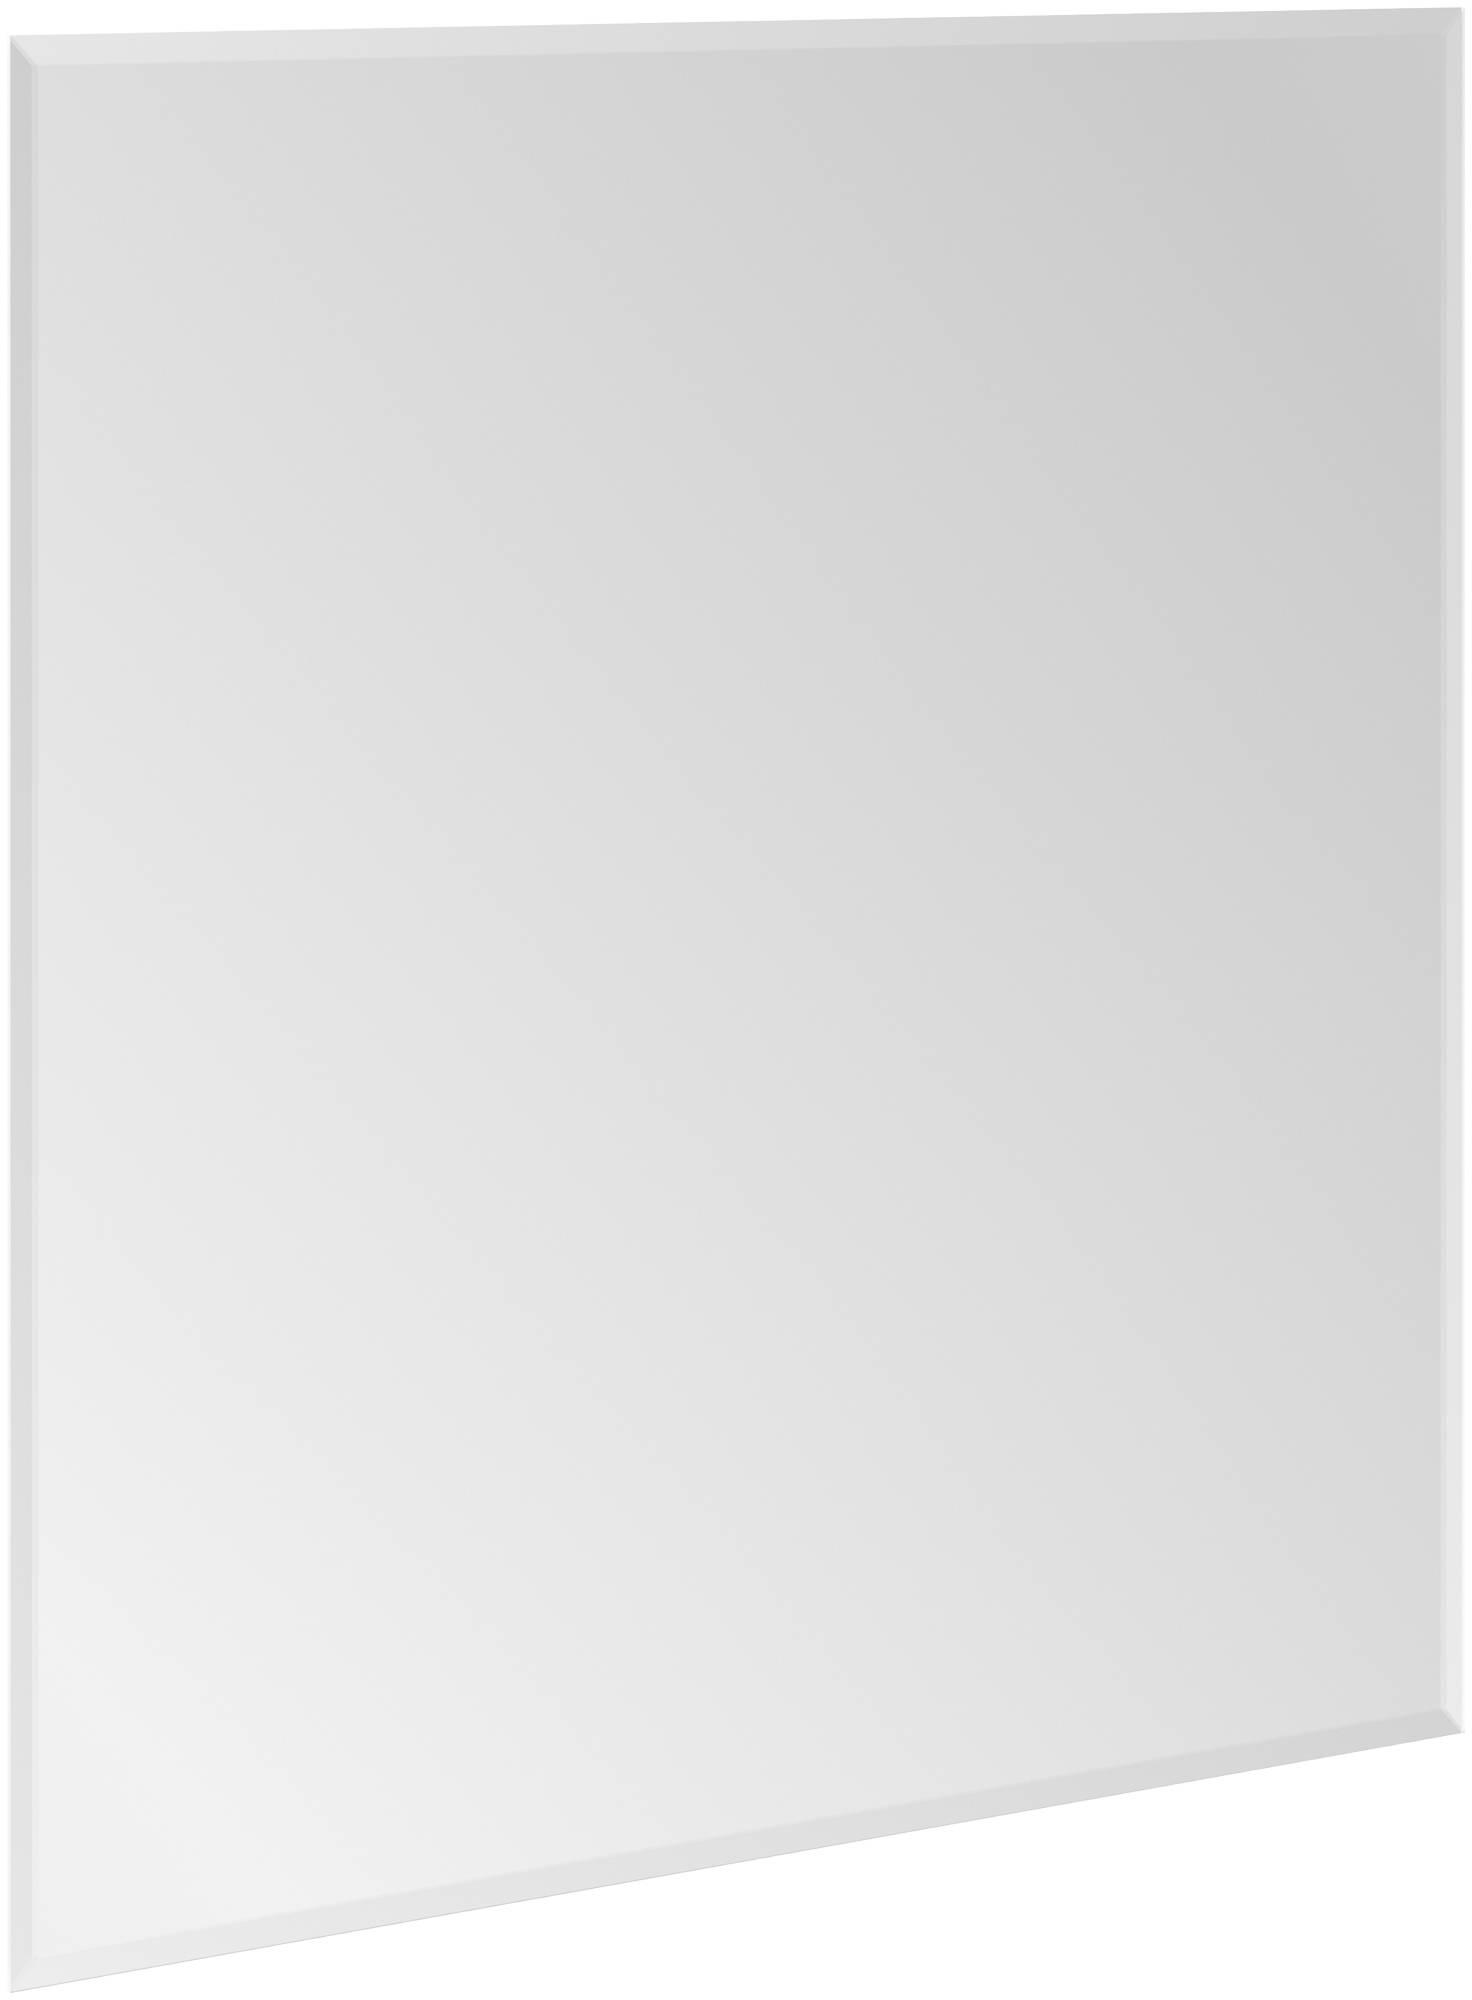 Villeroy & Boch Finion Spiegel 100x100 cm